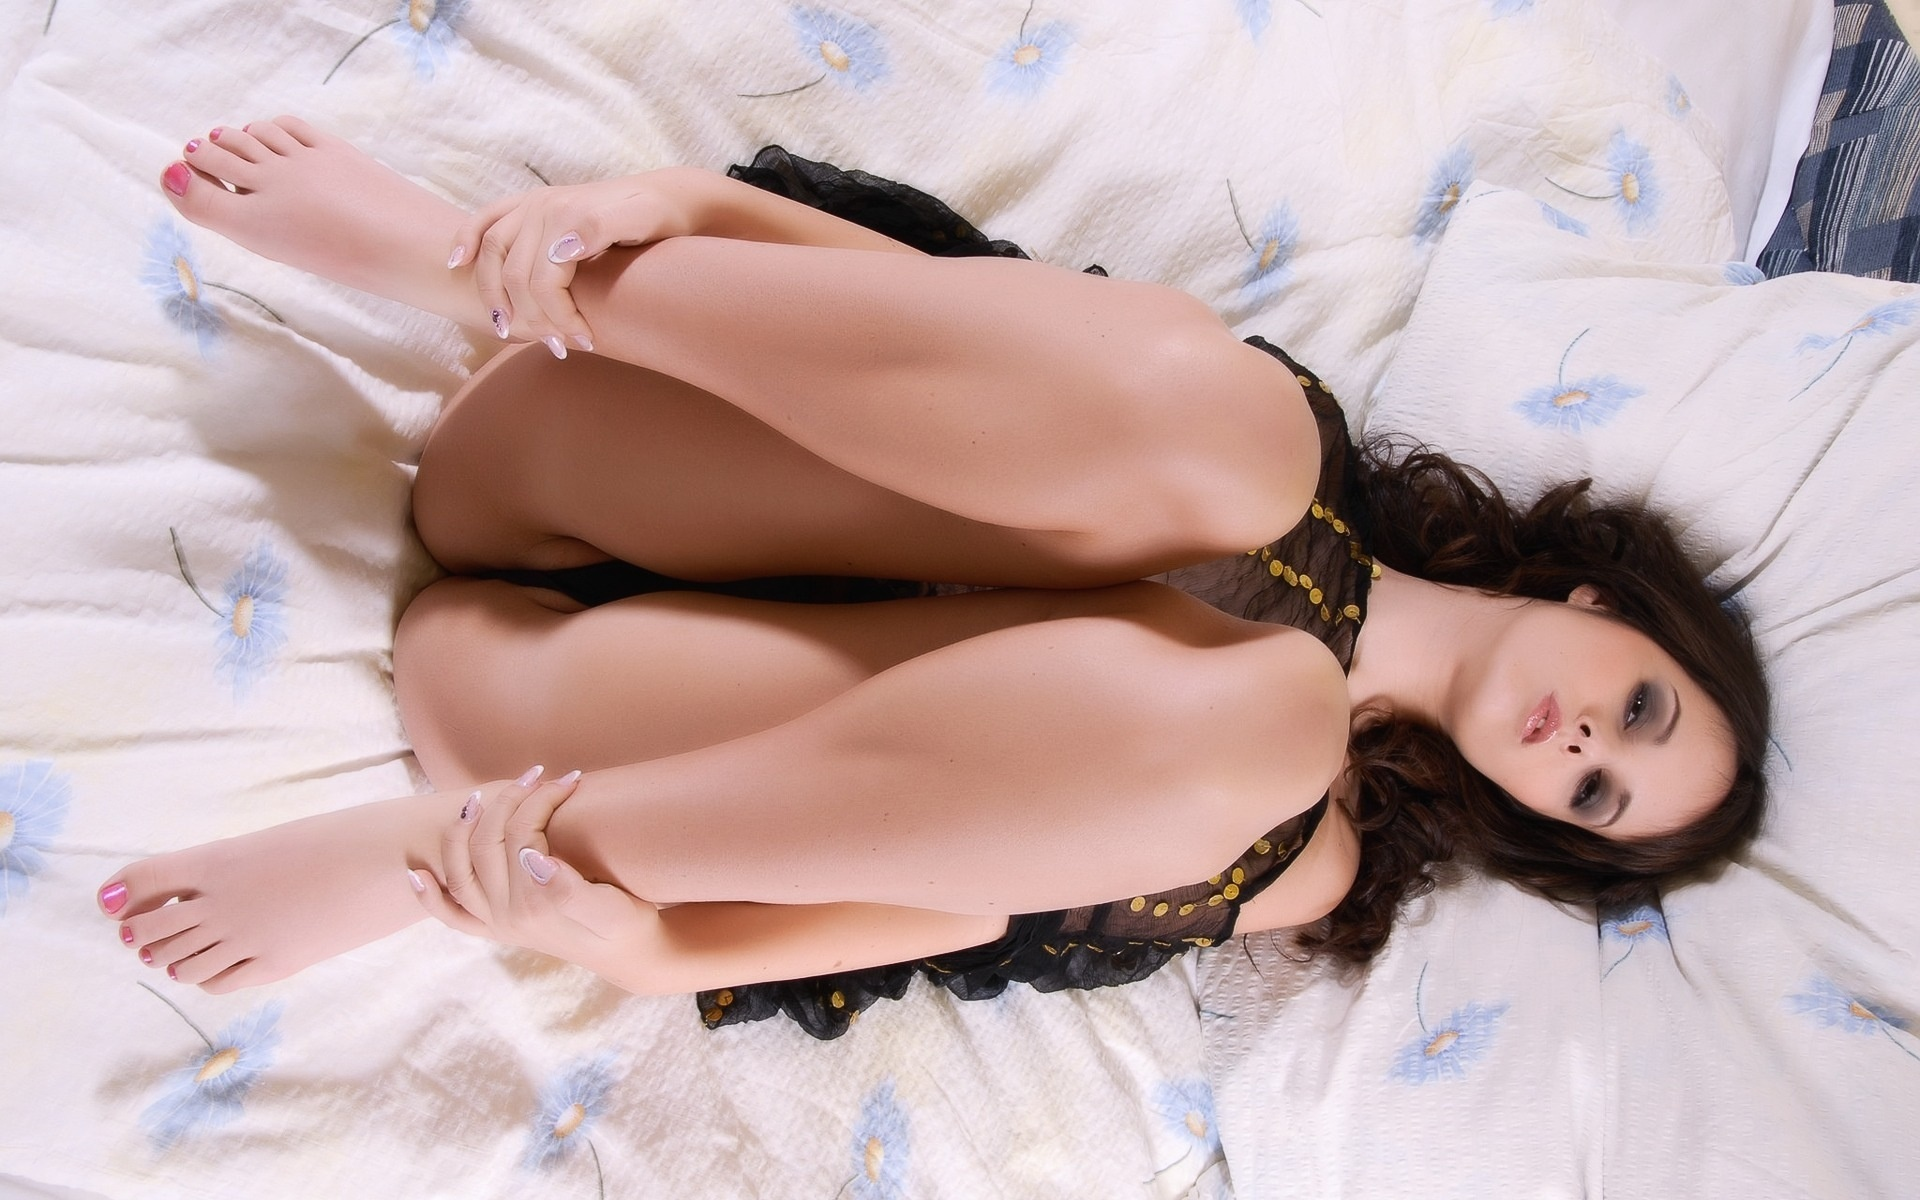 Секс на автамат бесплатна 24 фотография